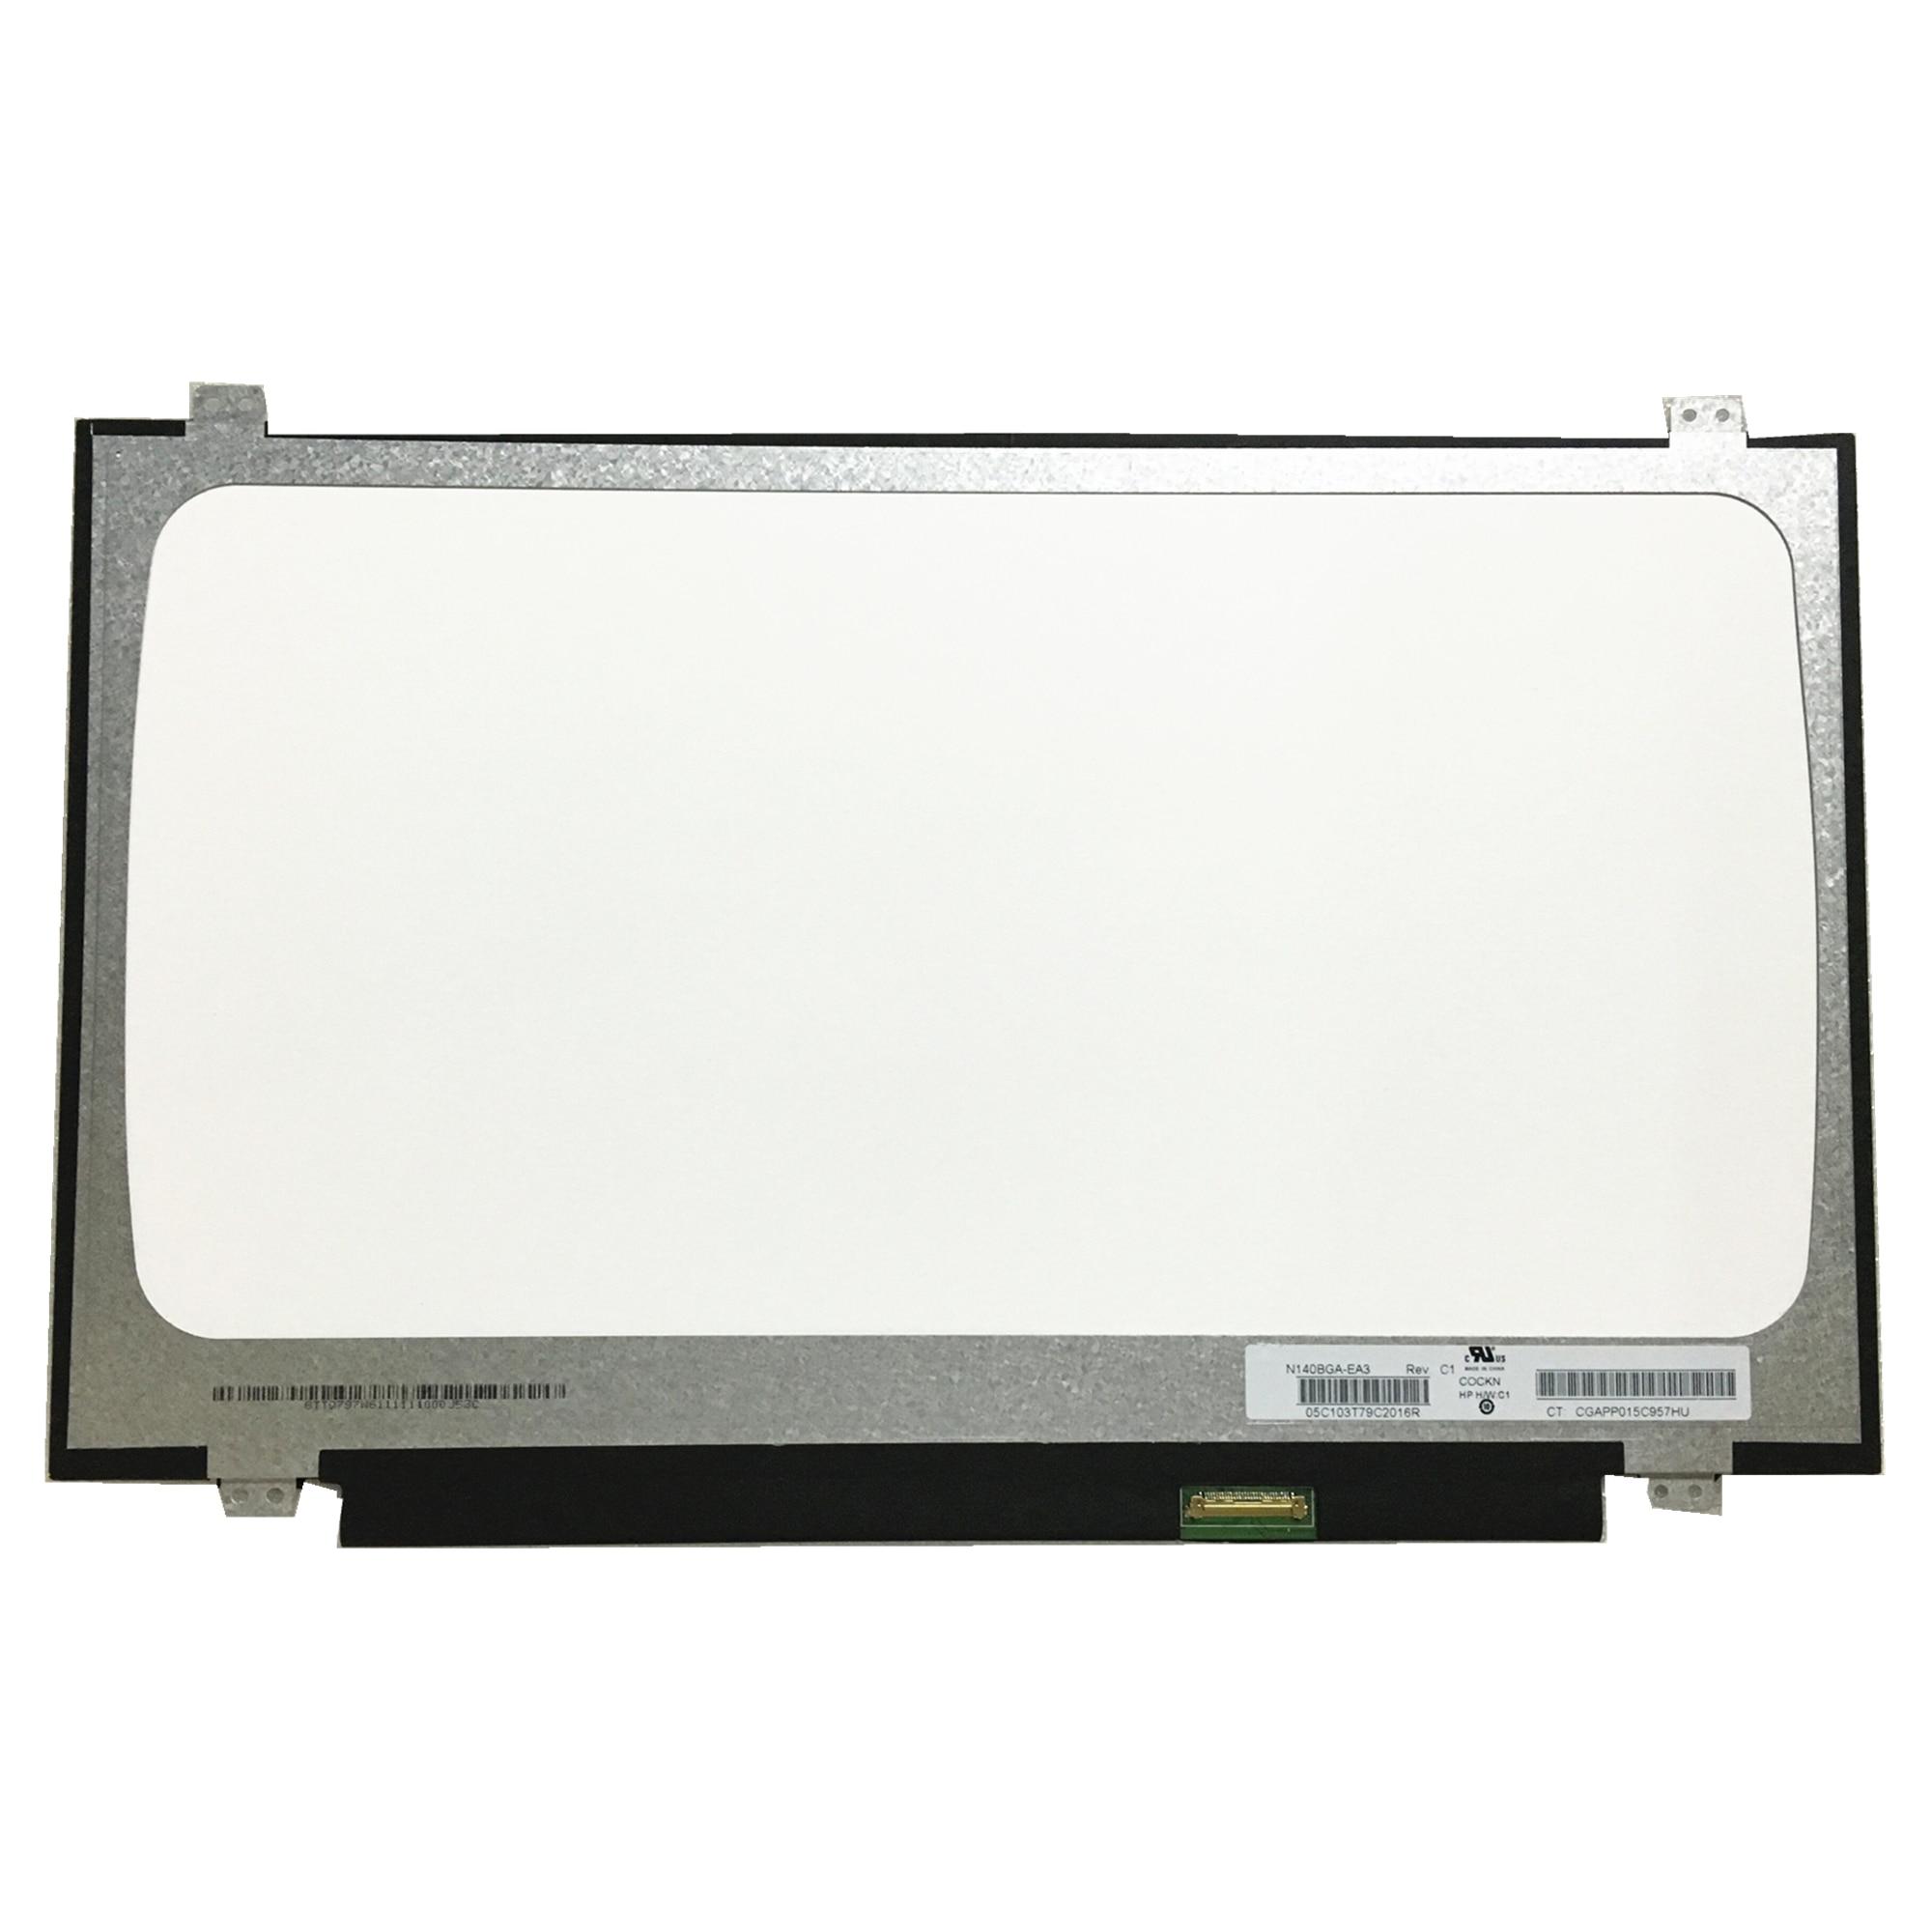 Free Shipping N140BGA EA3 N140BGA-EA3 N140BGE-EA3 N140BGA EA4 N140BGE E33 HB140WX1-601 Laptop LCD Screen 1366*768 EDP 30pin